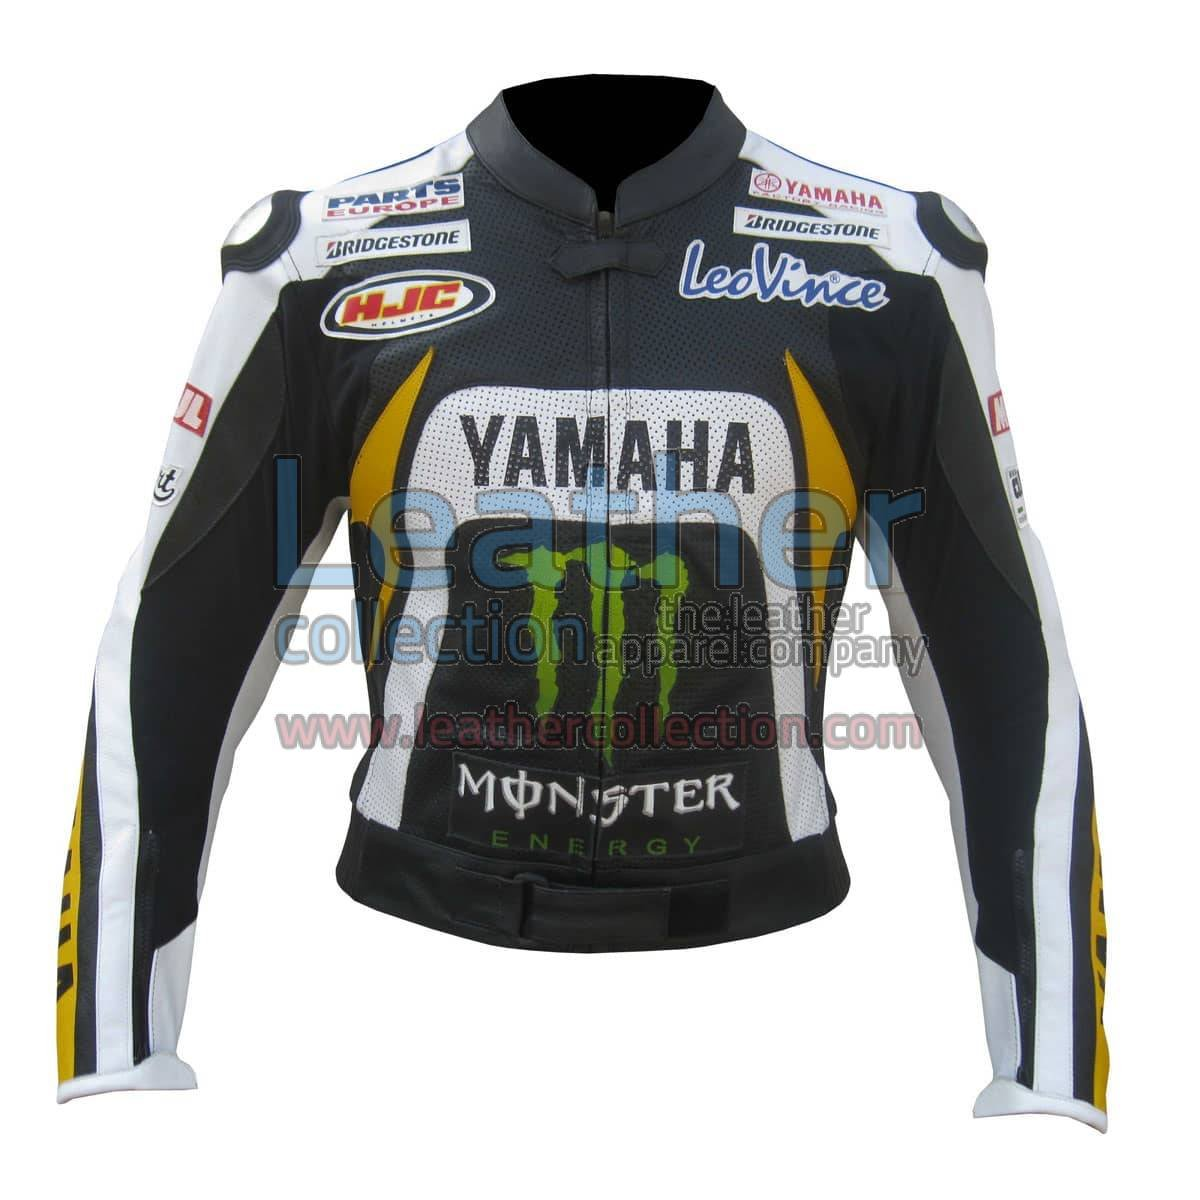 Ben Spies Yamaha Monster 2010 Leather jacket